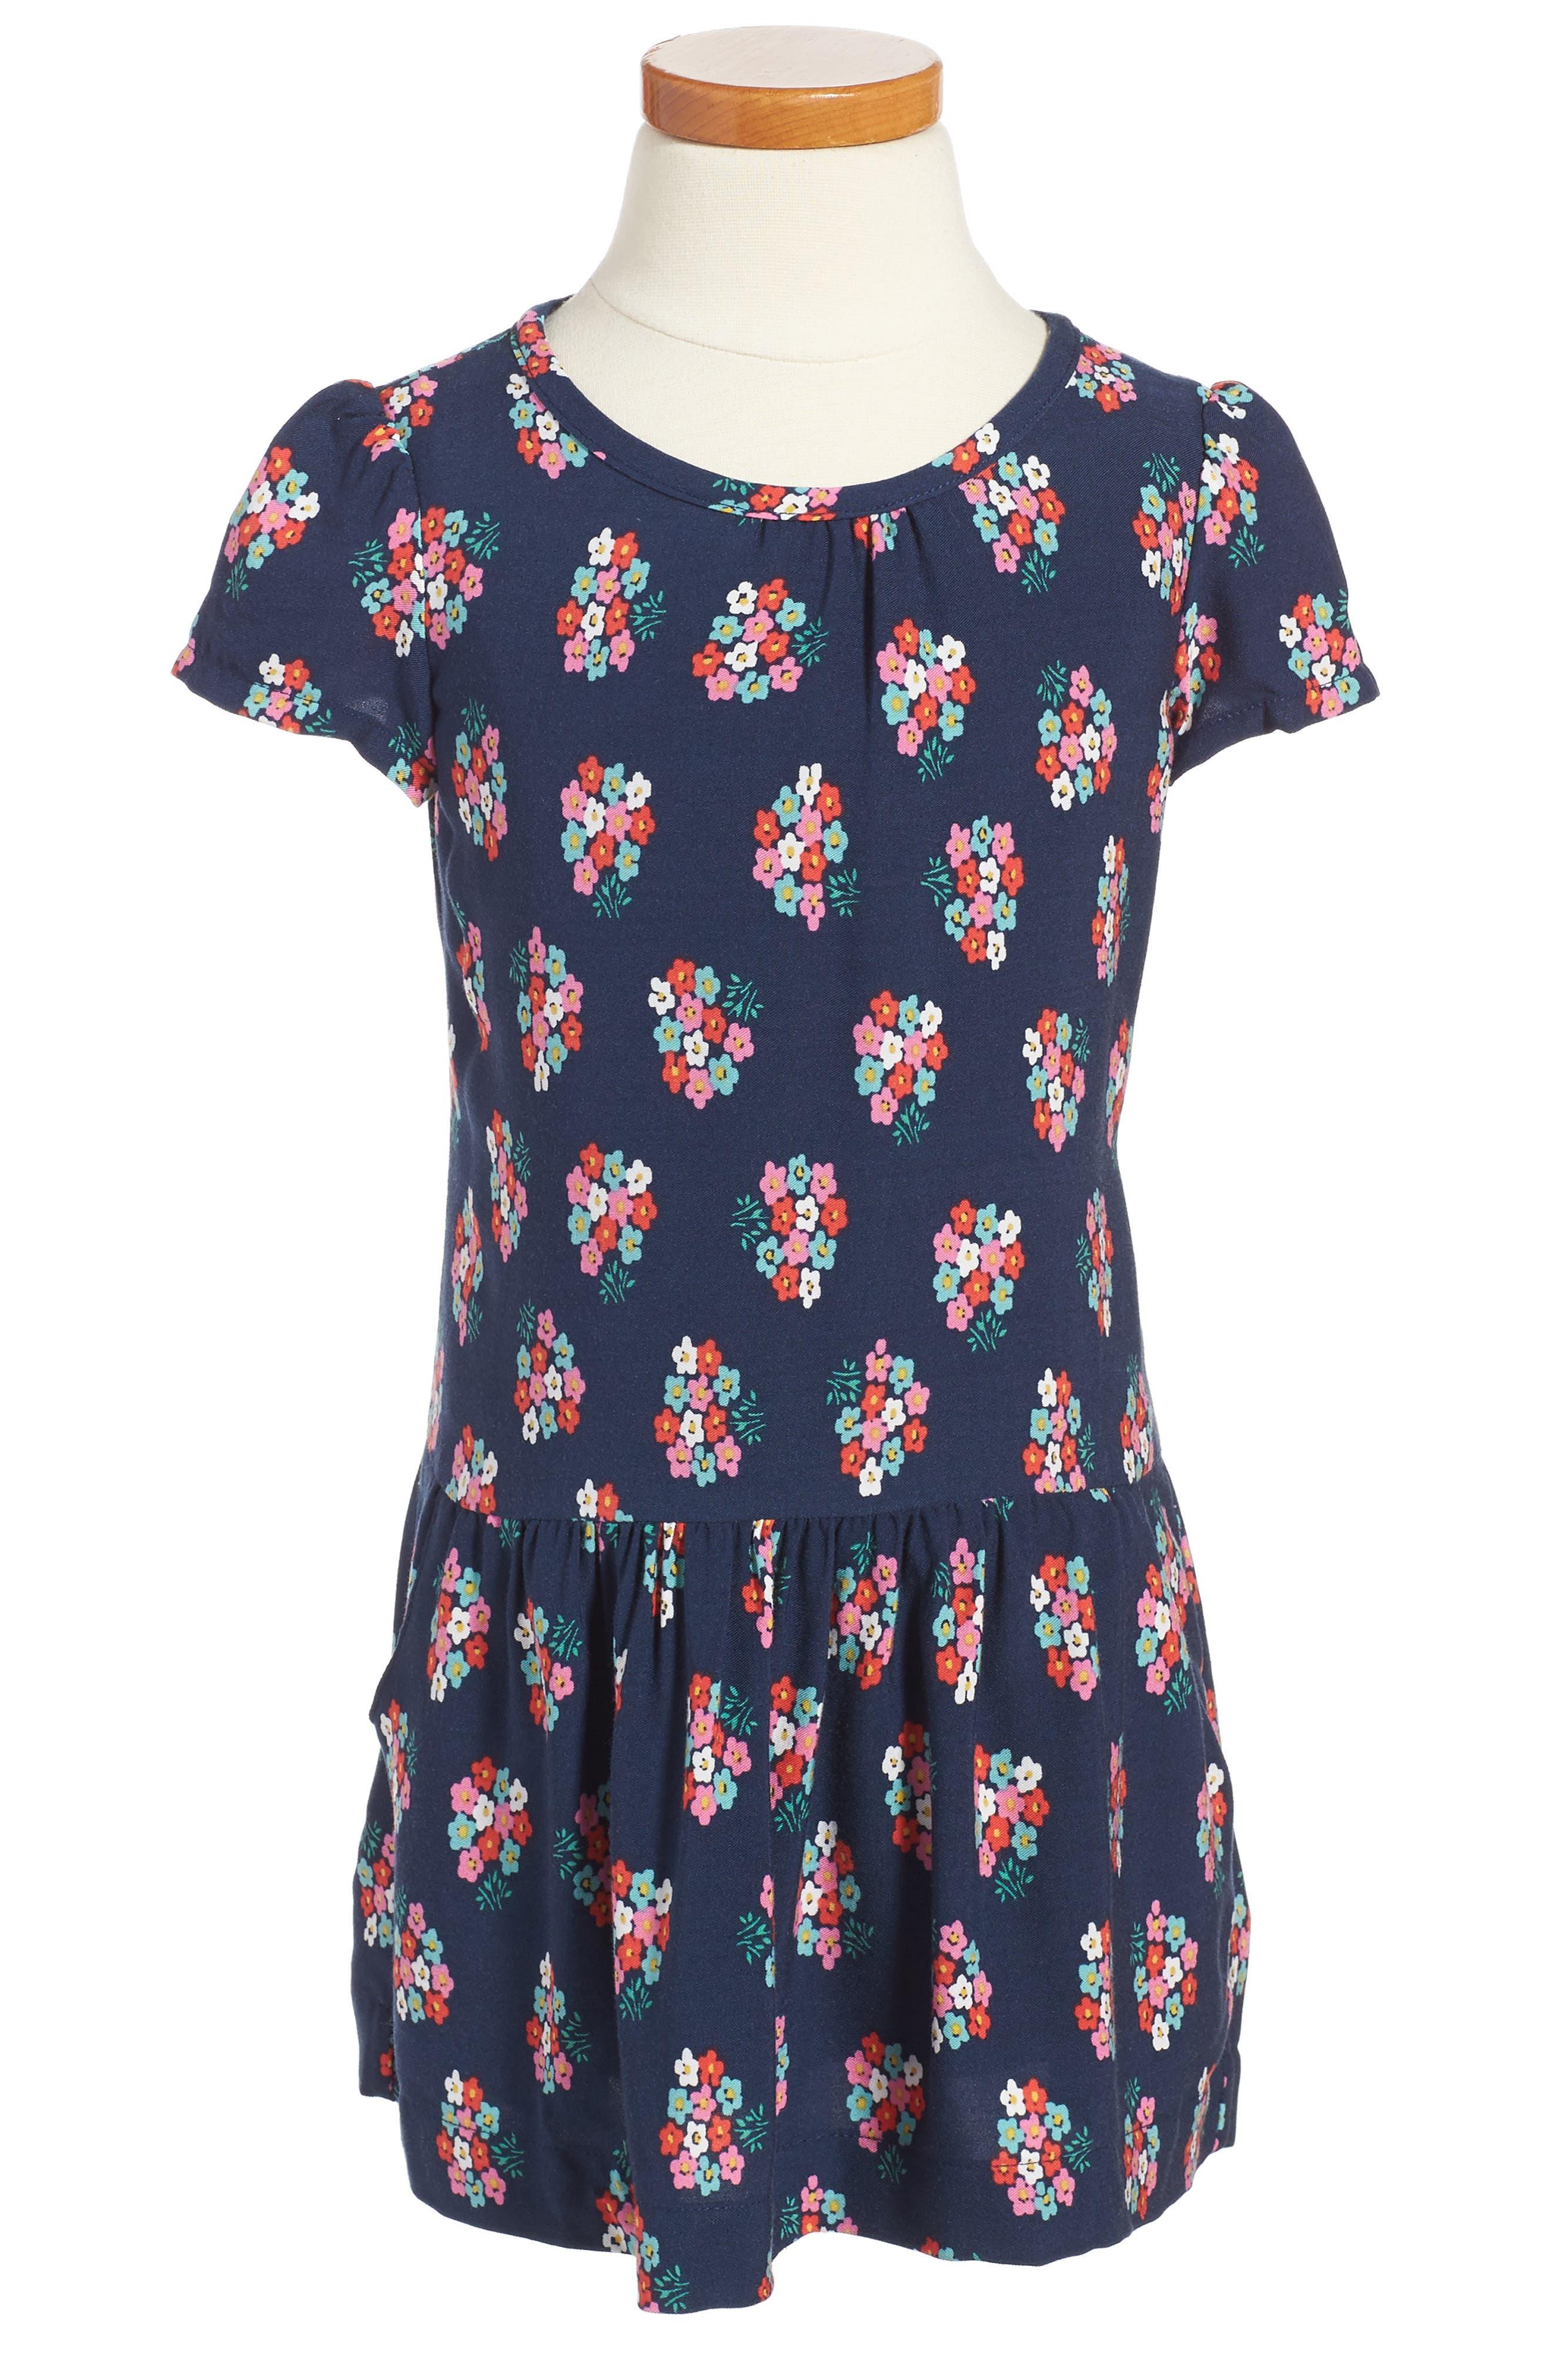 Main Image - Mini Boden Print Tea Dress (Toddler Girls, Little Girls & Big Girls)